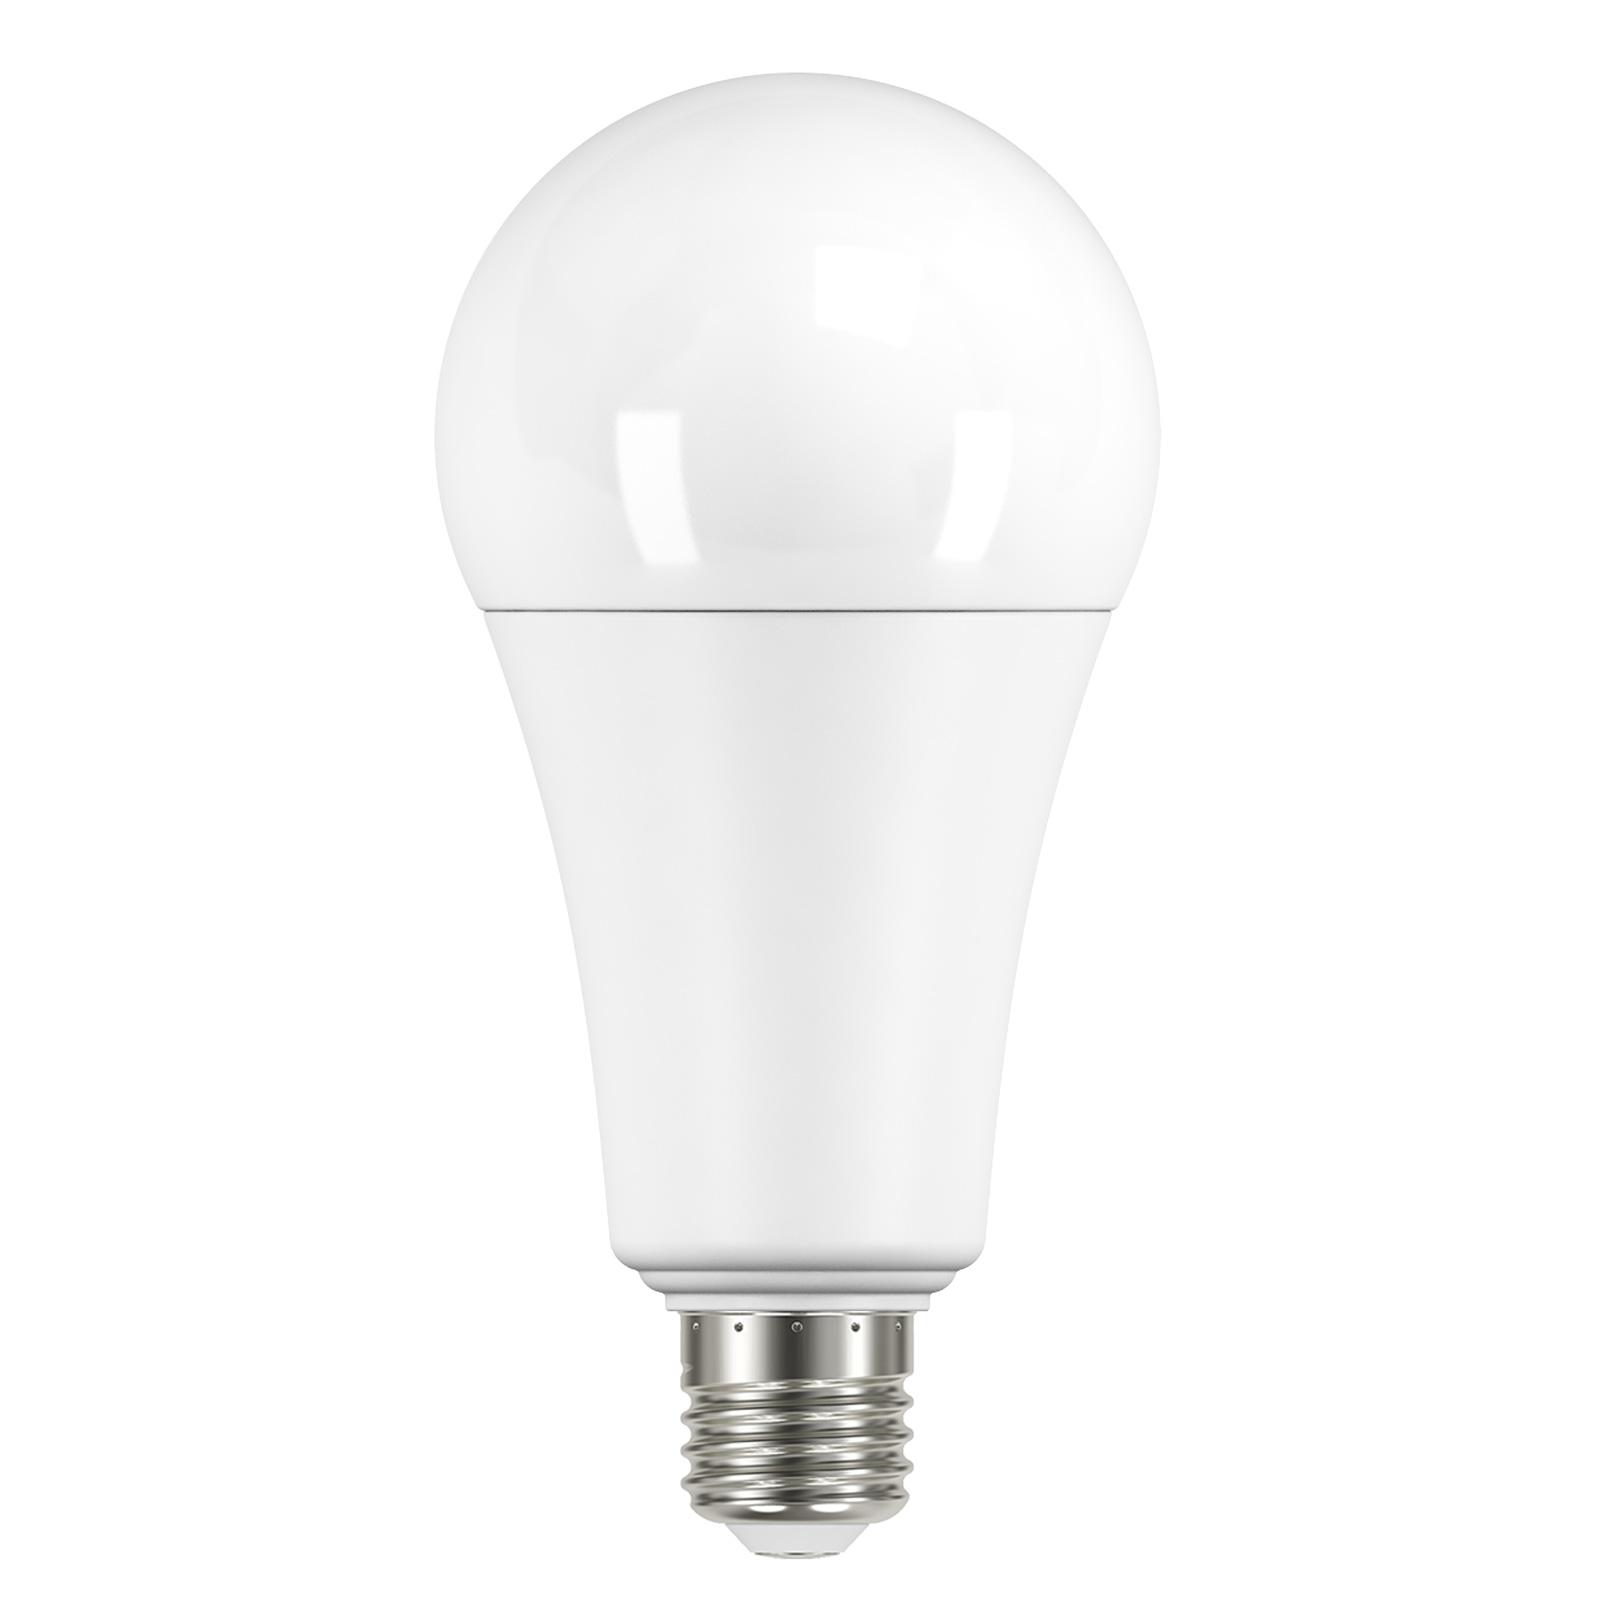 Carus led lampor du kan köpa online | Lampkultur.se